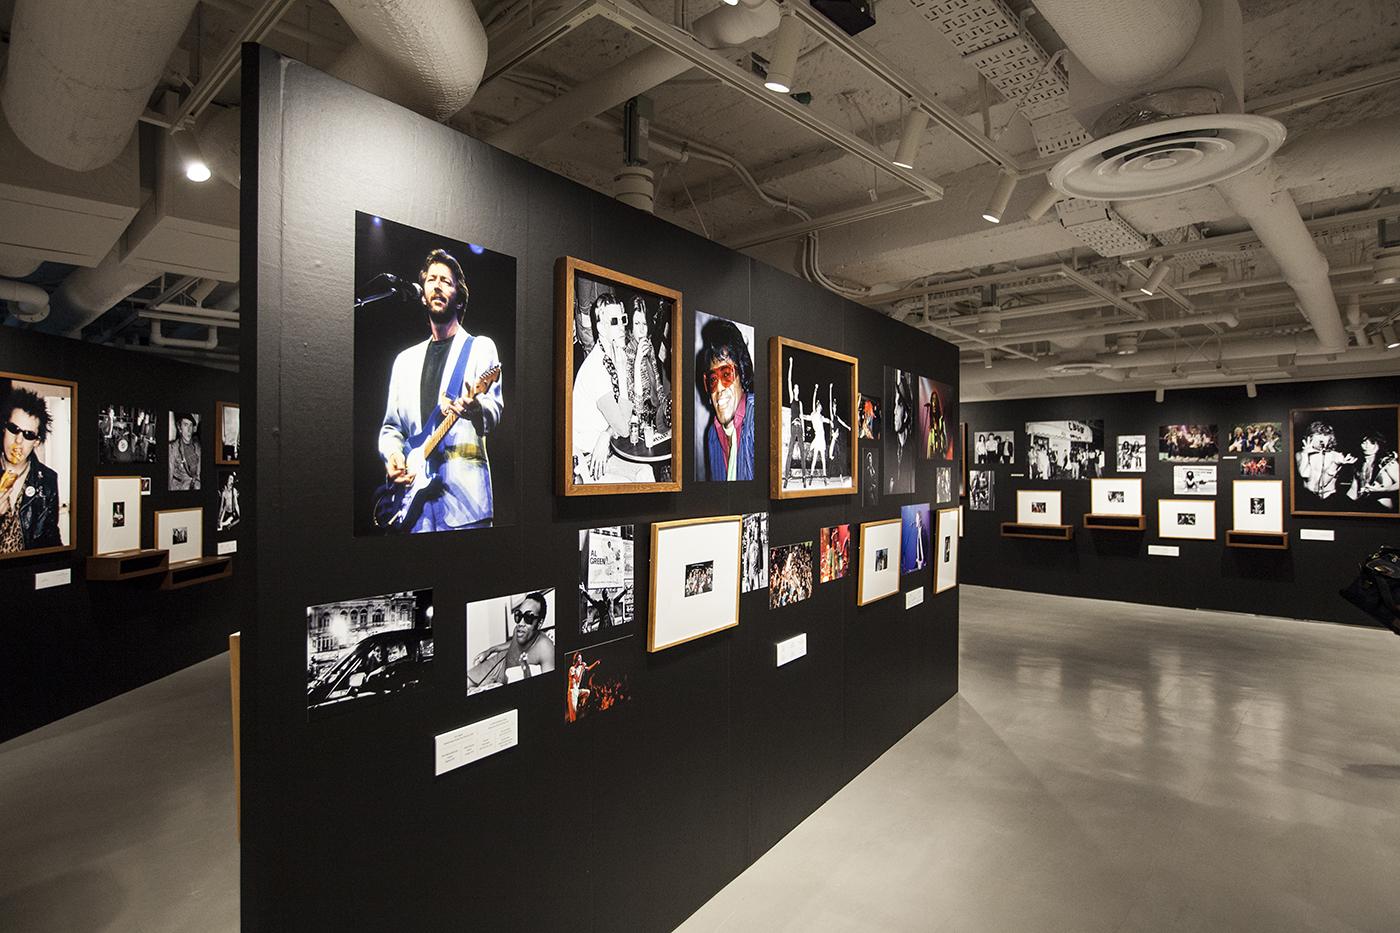 m-0021 【レポート】ロックの歴史が凝縮。フジロックファンも必見のボブ・グルーエン写真展